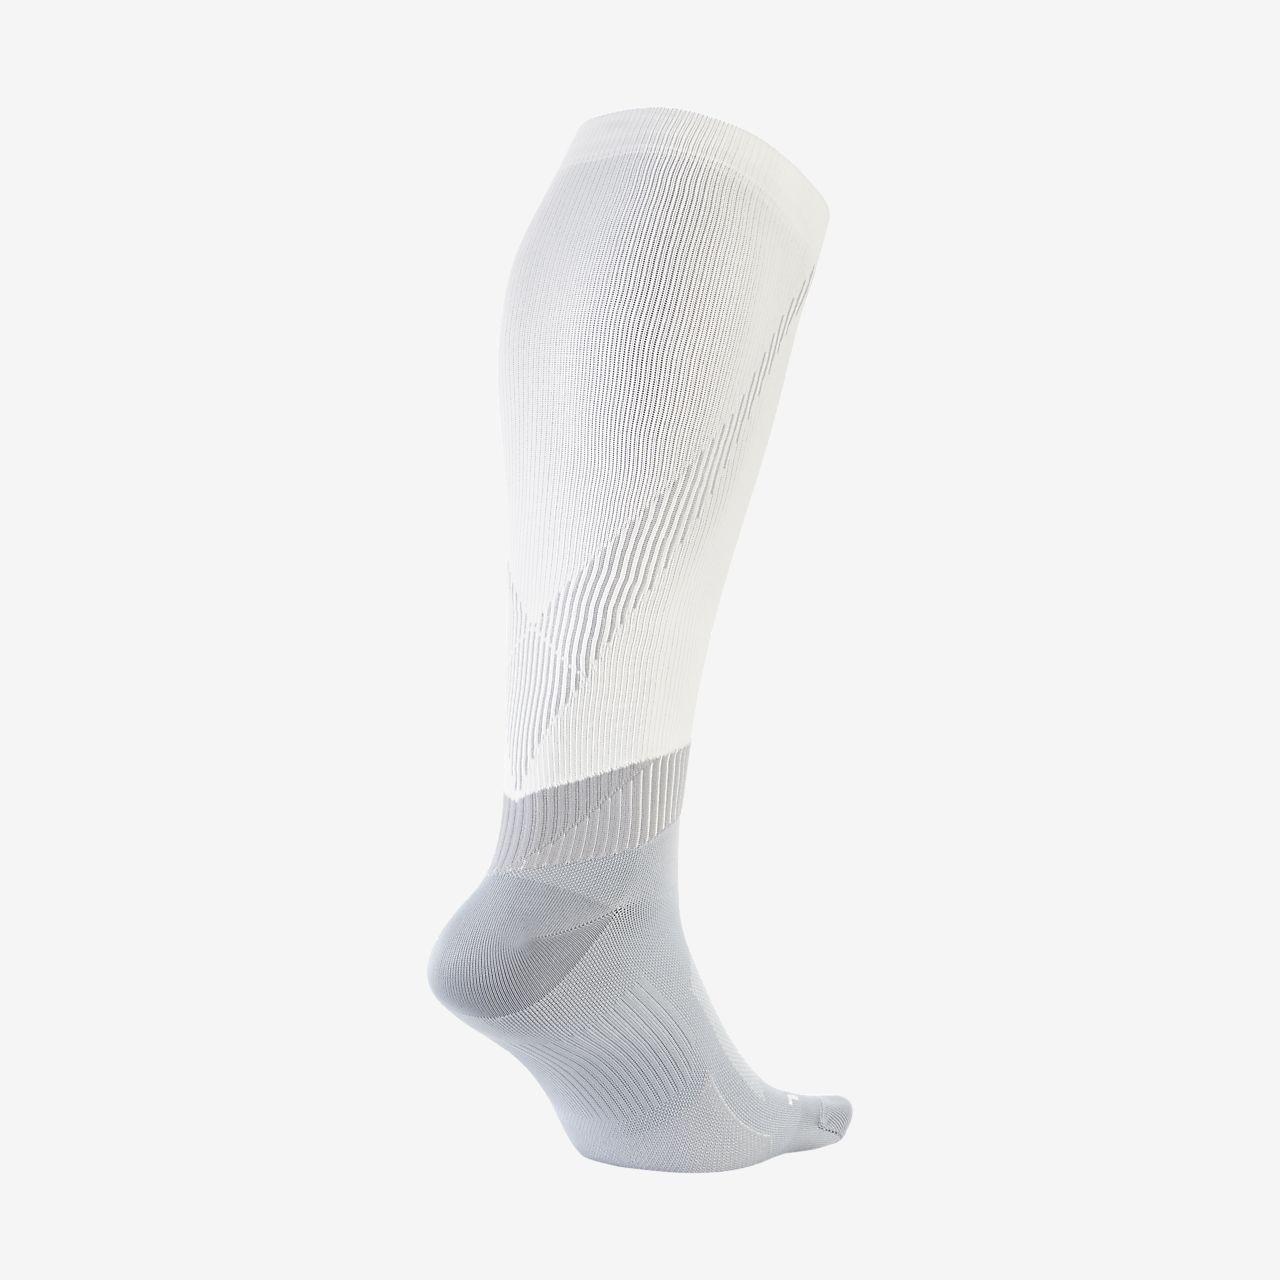 Chaussettes de running Nike Elite Over-The-Calf